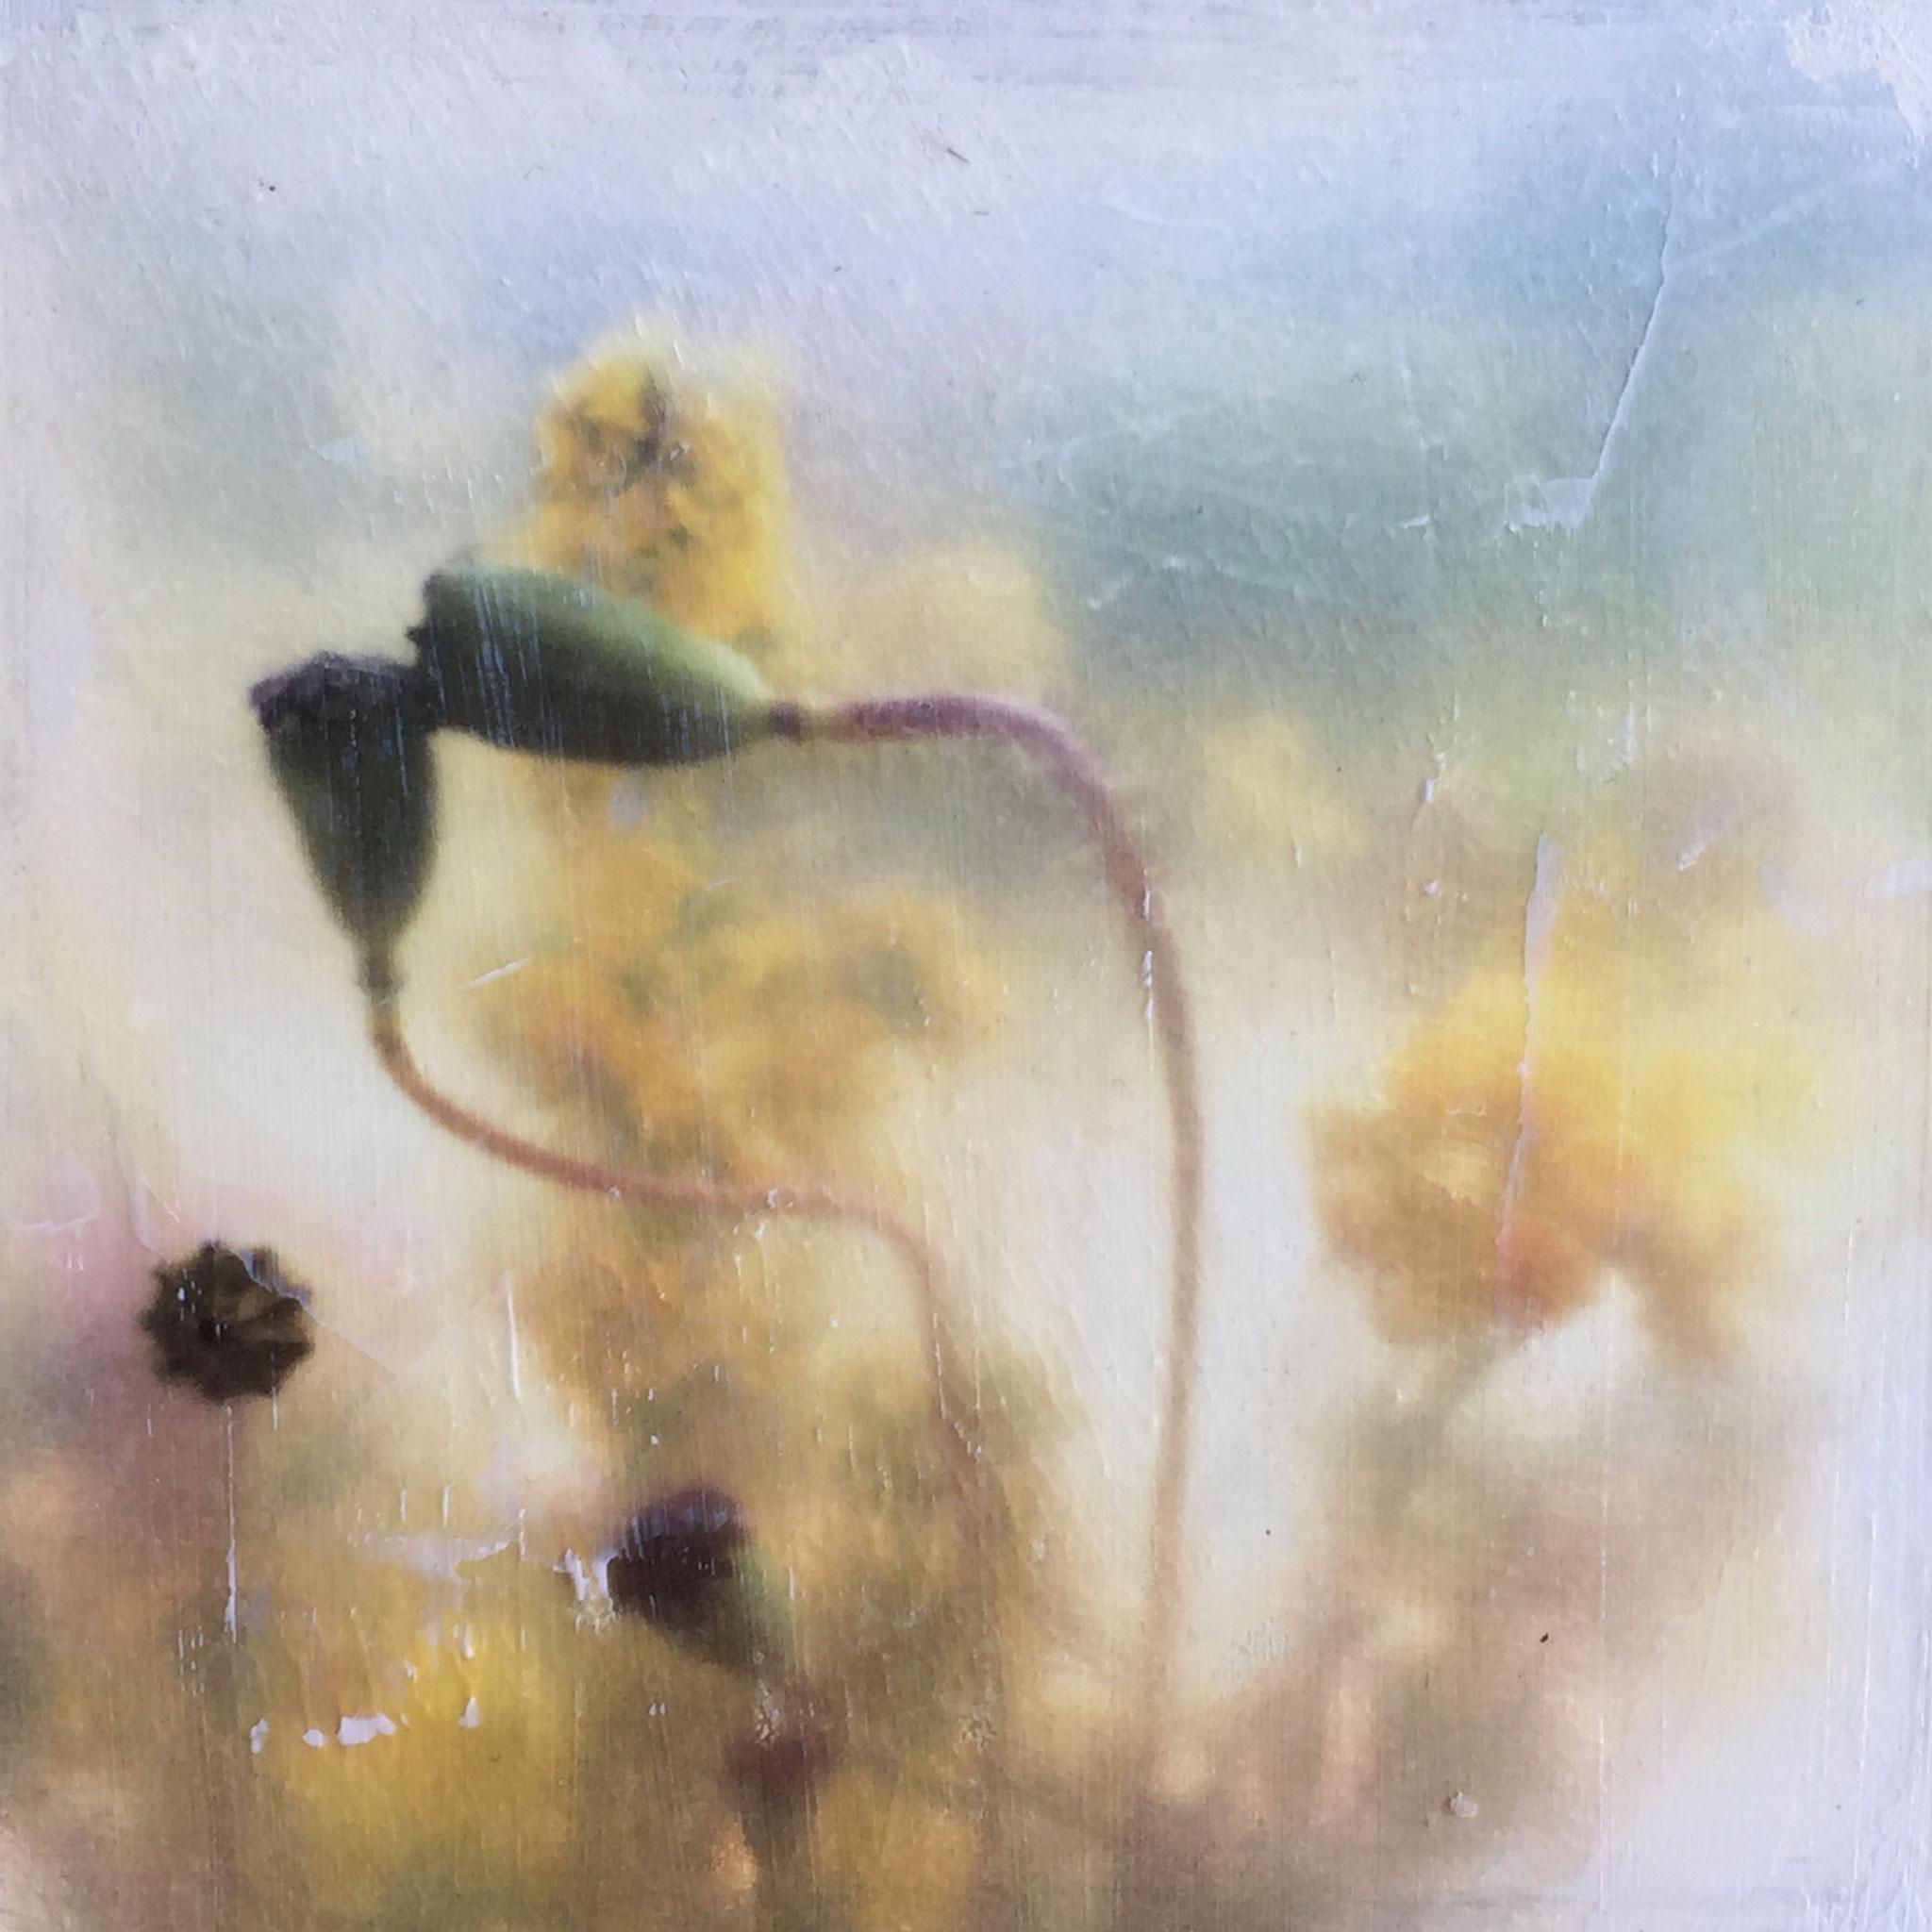 Poppy 5_Kleinformat (Fototransfer)